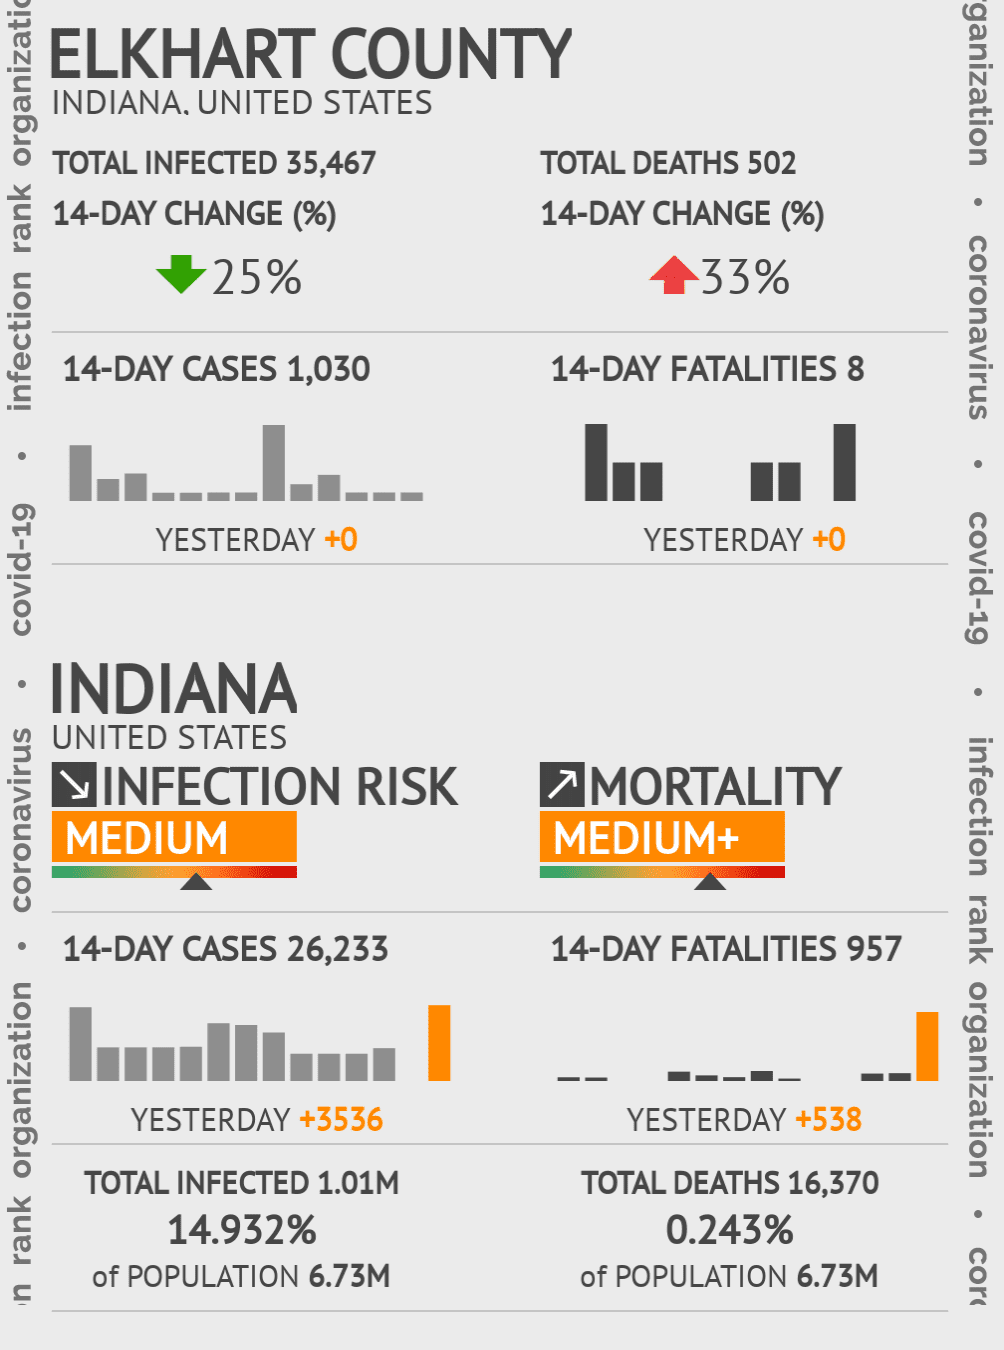 Elkhart County Coronavirus Covid-19 Risk of Infection on July 24, 2021